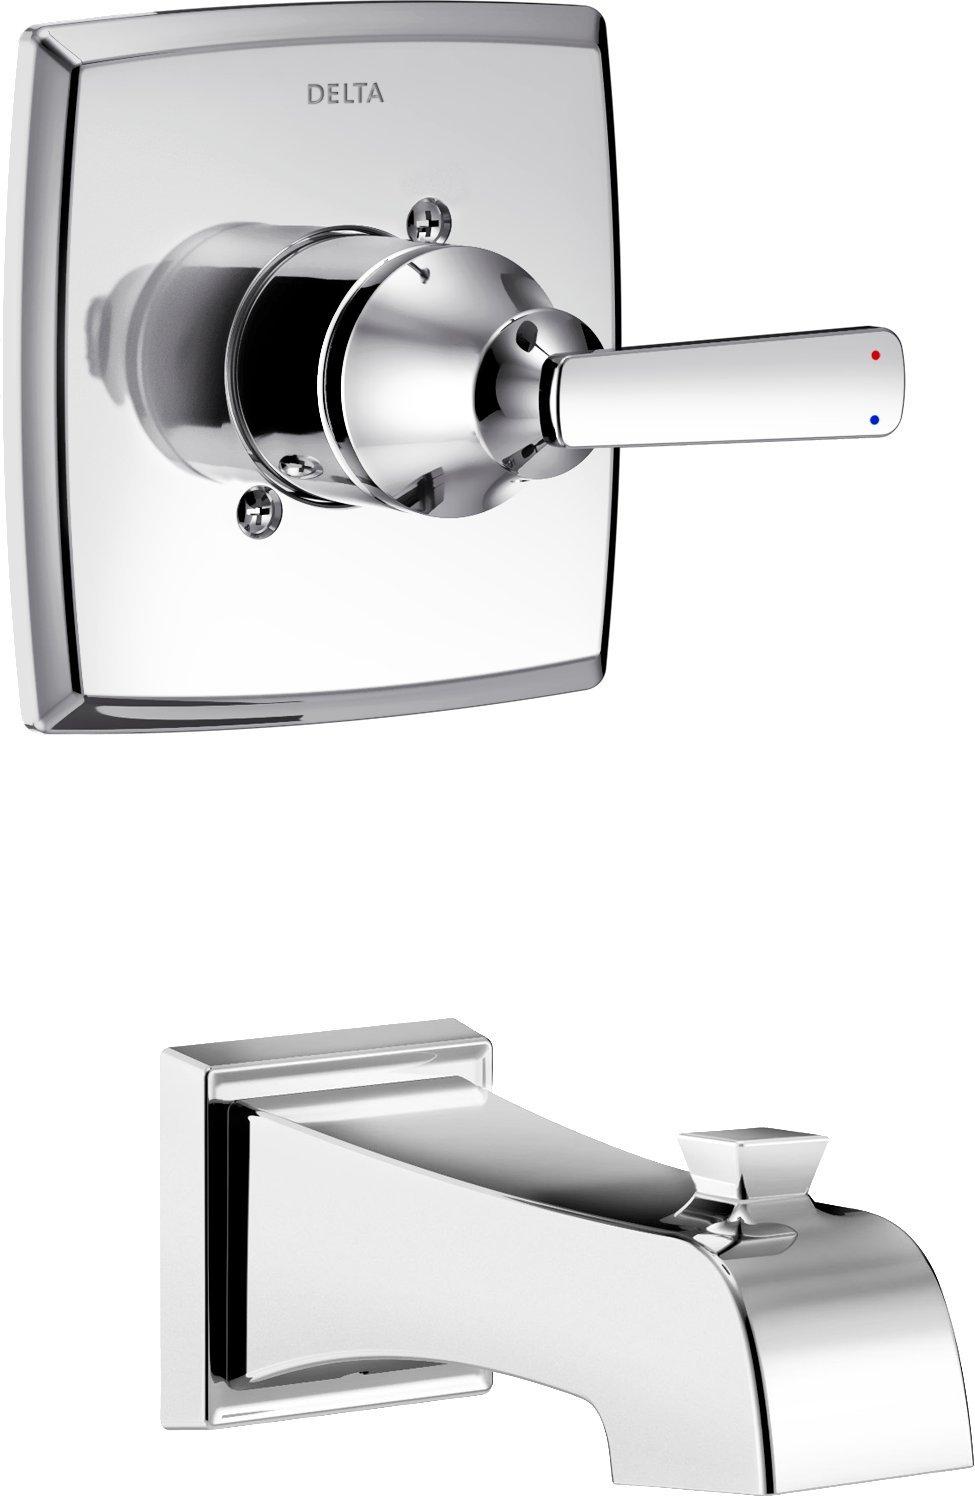 Delta Faucet T14164 Ashlyn Tub Trim, Chrome - - Amazon.com